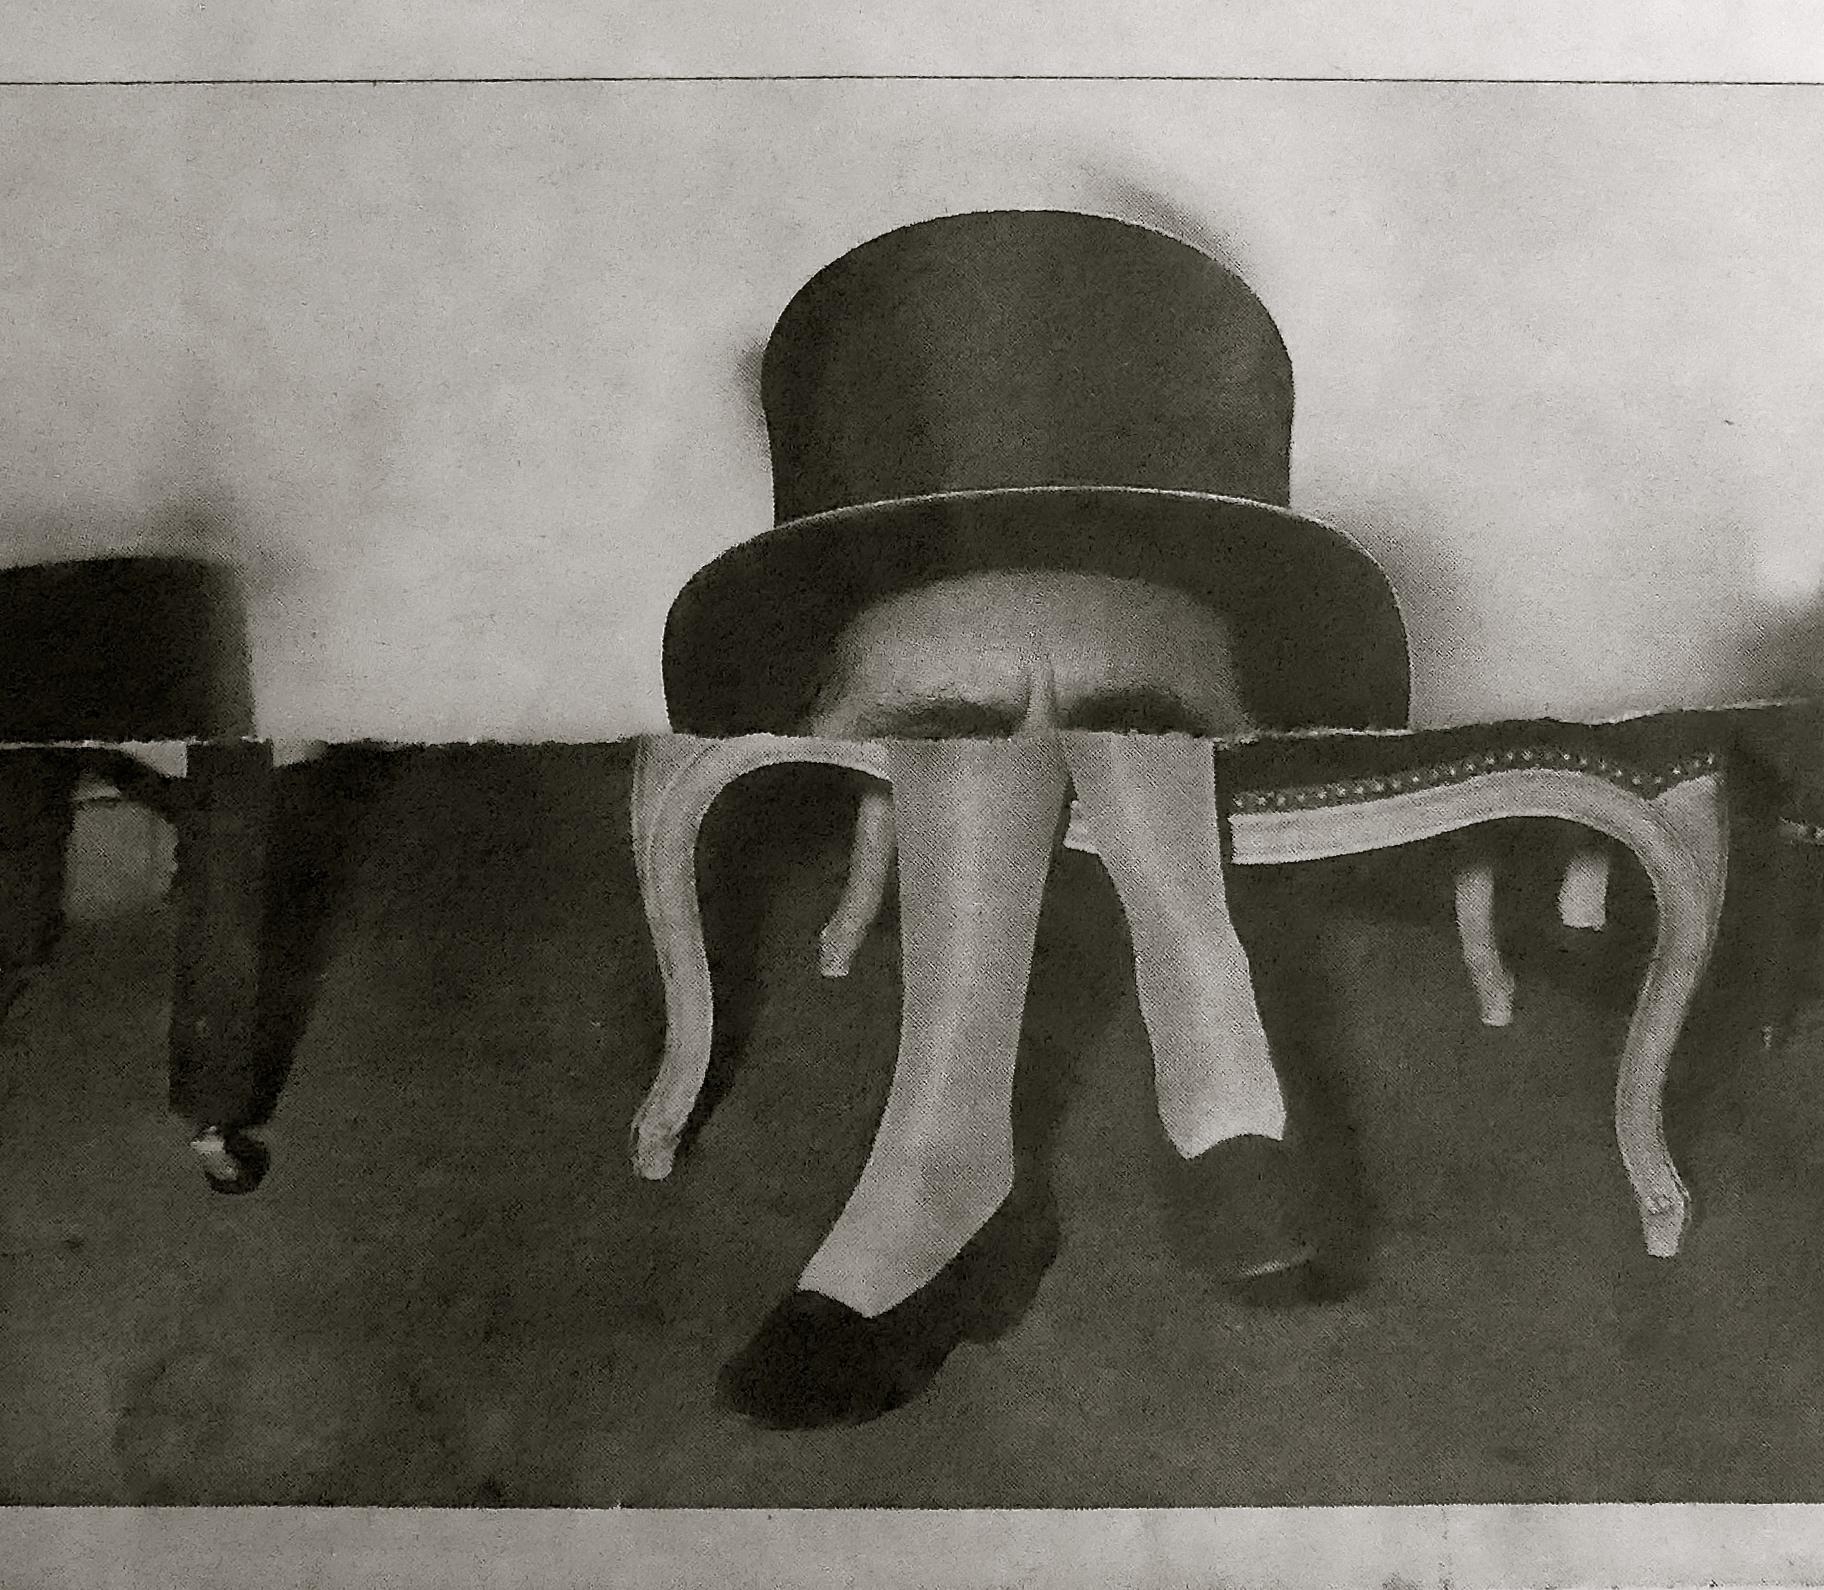 Dorothy Parker de copas Collage Cryp.